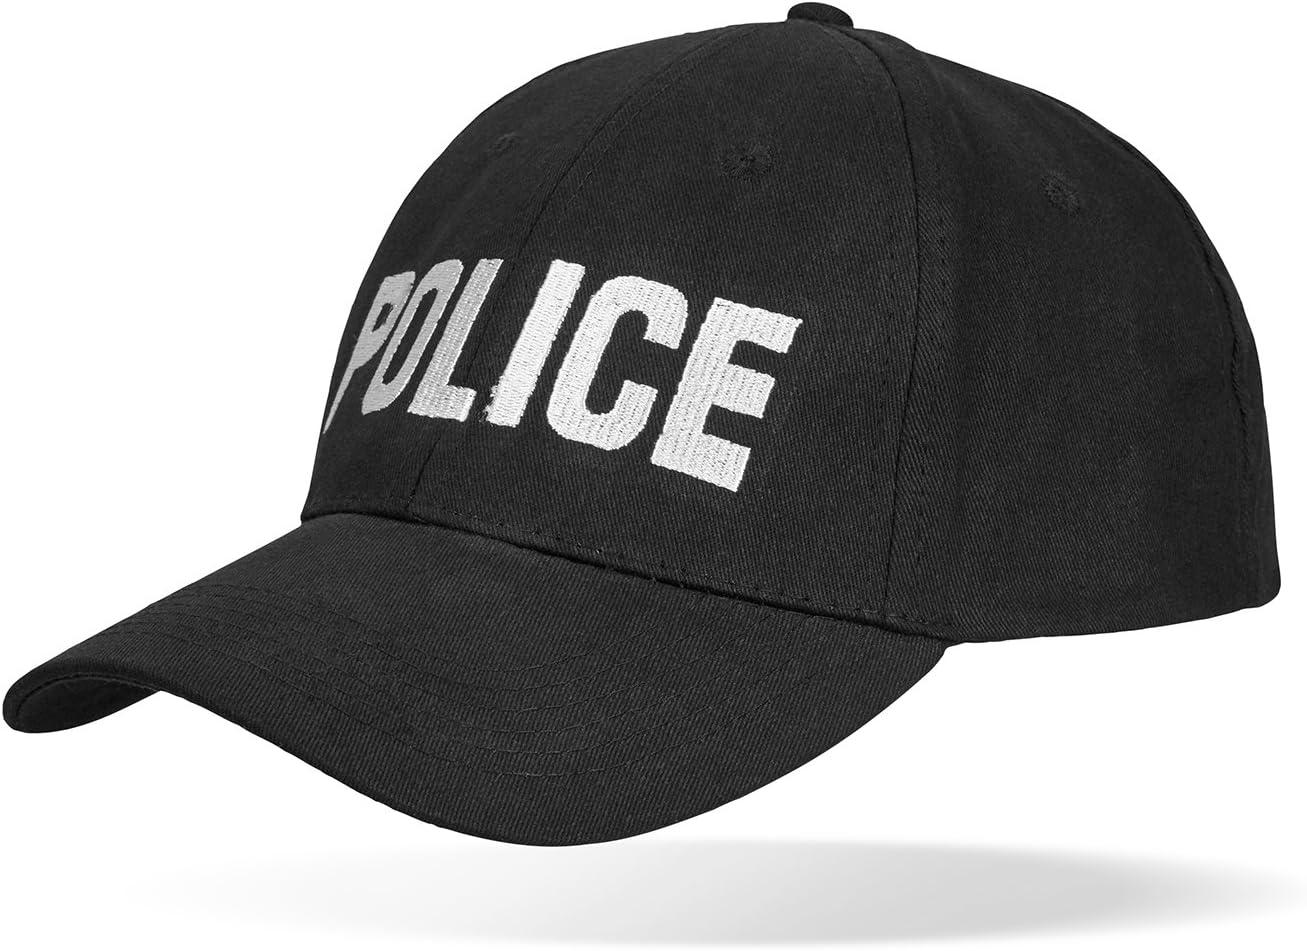 Black Snake SWAT FBI Security Police Baseballcap gr/ö/ßenverstellbar durch Clipverschluss